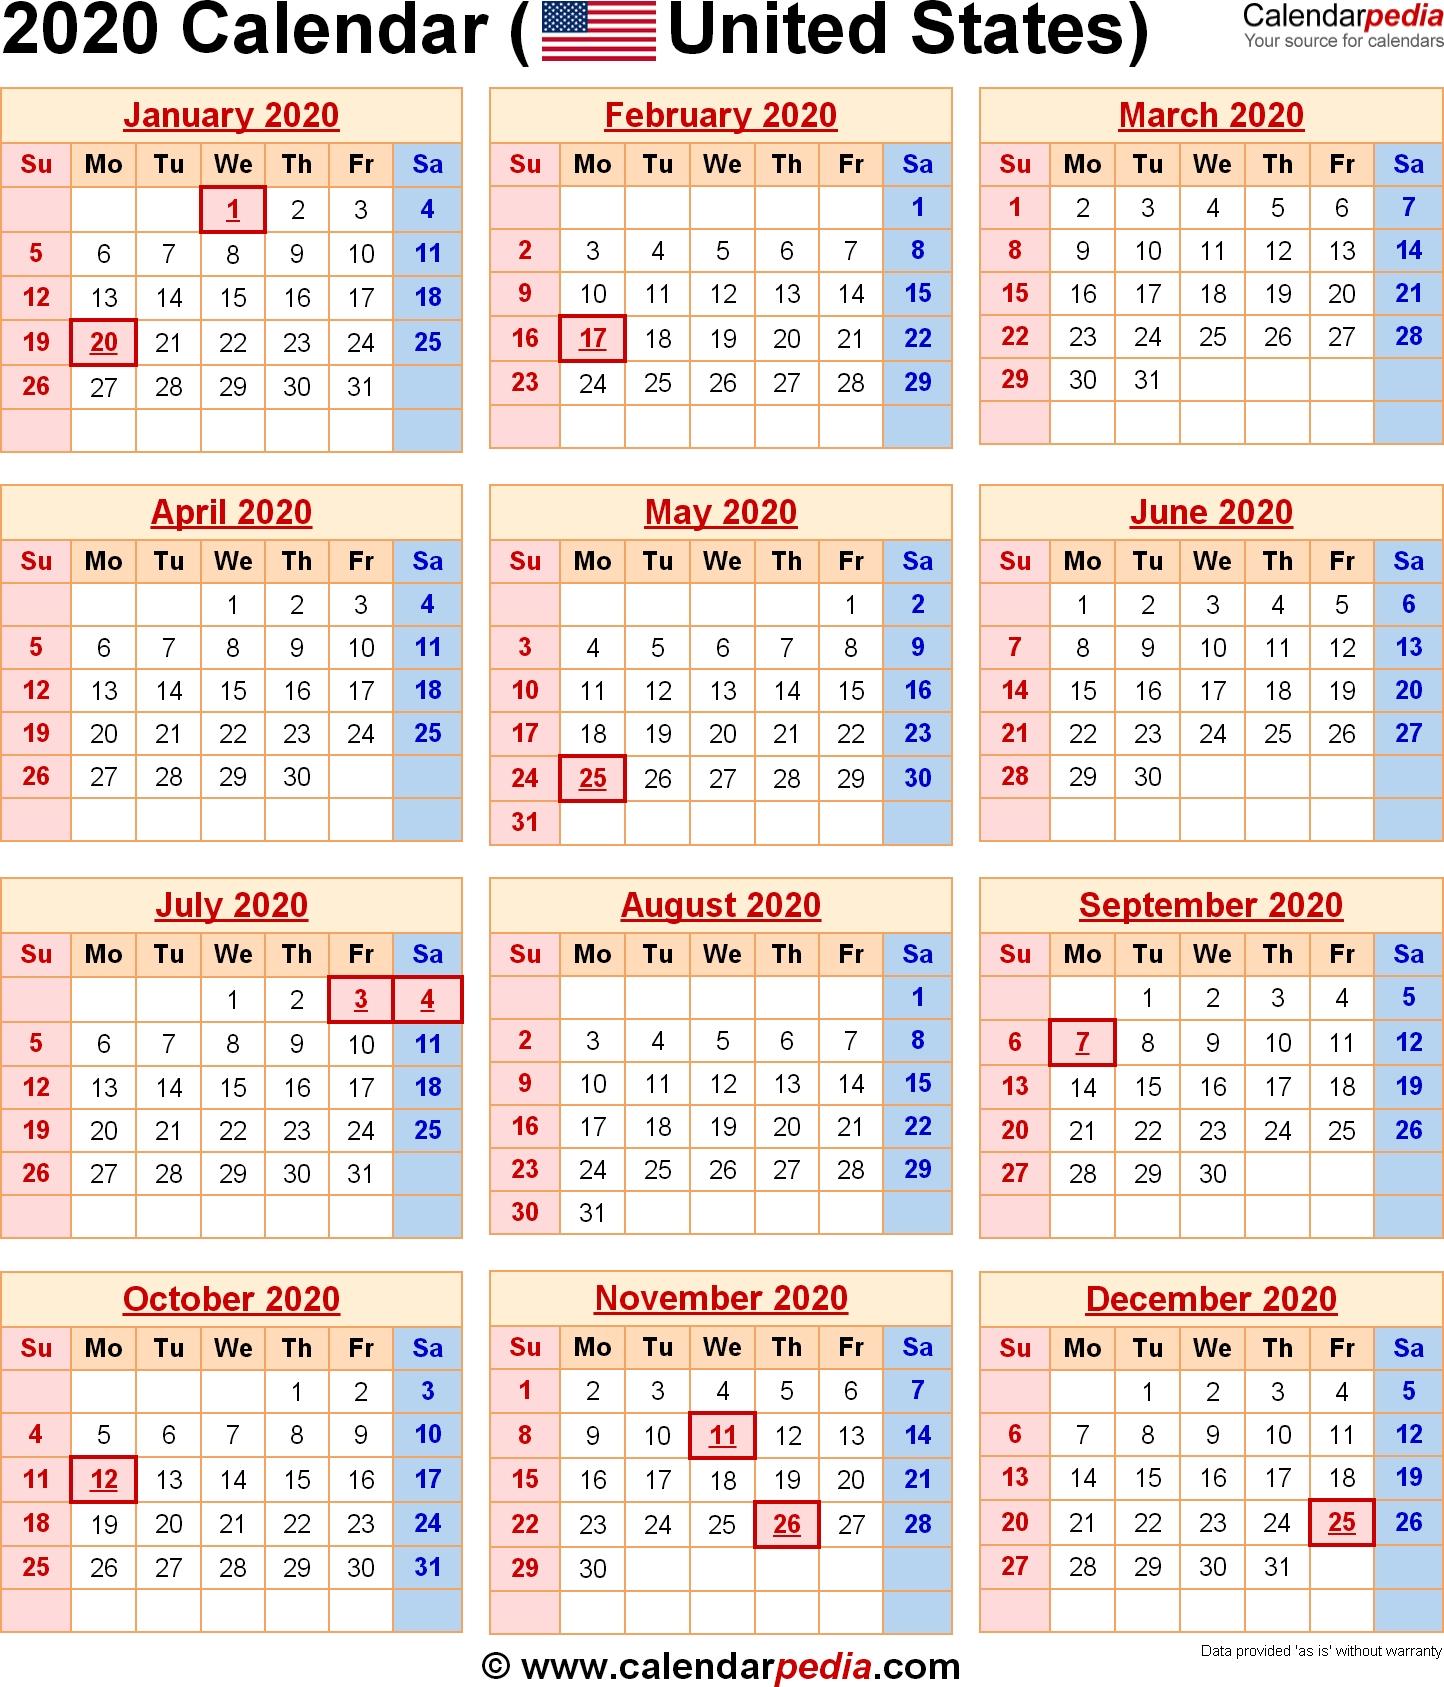 2020 Calendar With Federal Holidays & Excel/pdf/word Templates Dashing 2020 Calendar With Holidays